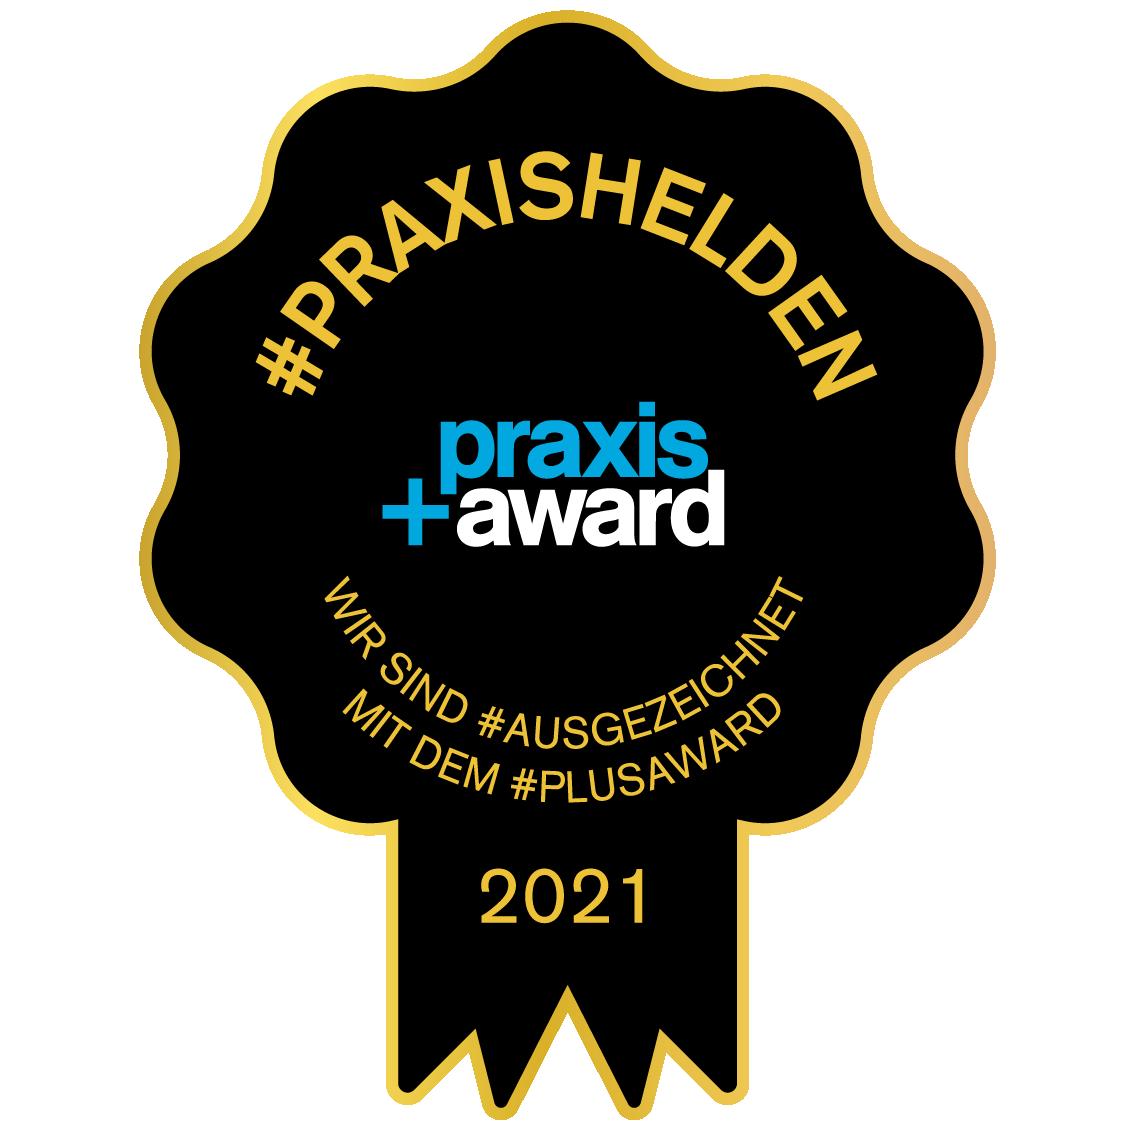 Praxis Award 2021 Qualitätssiegel